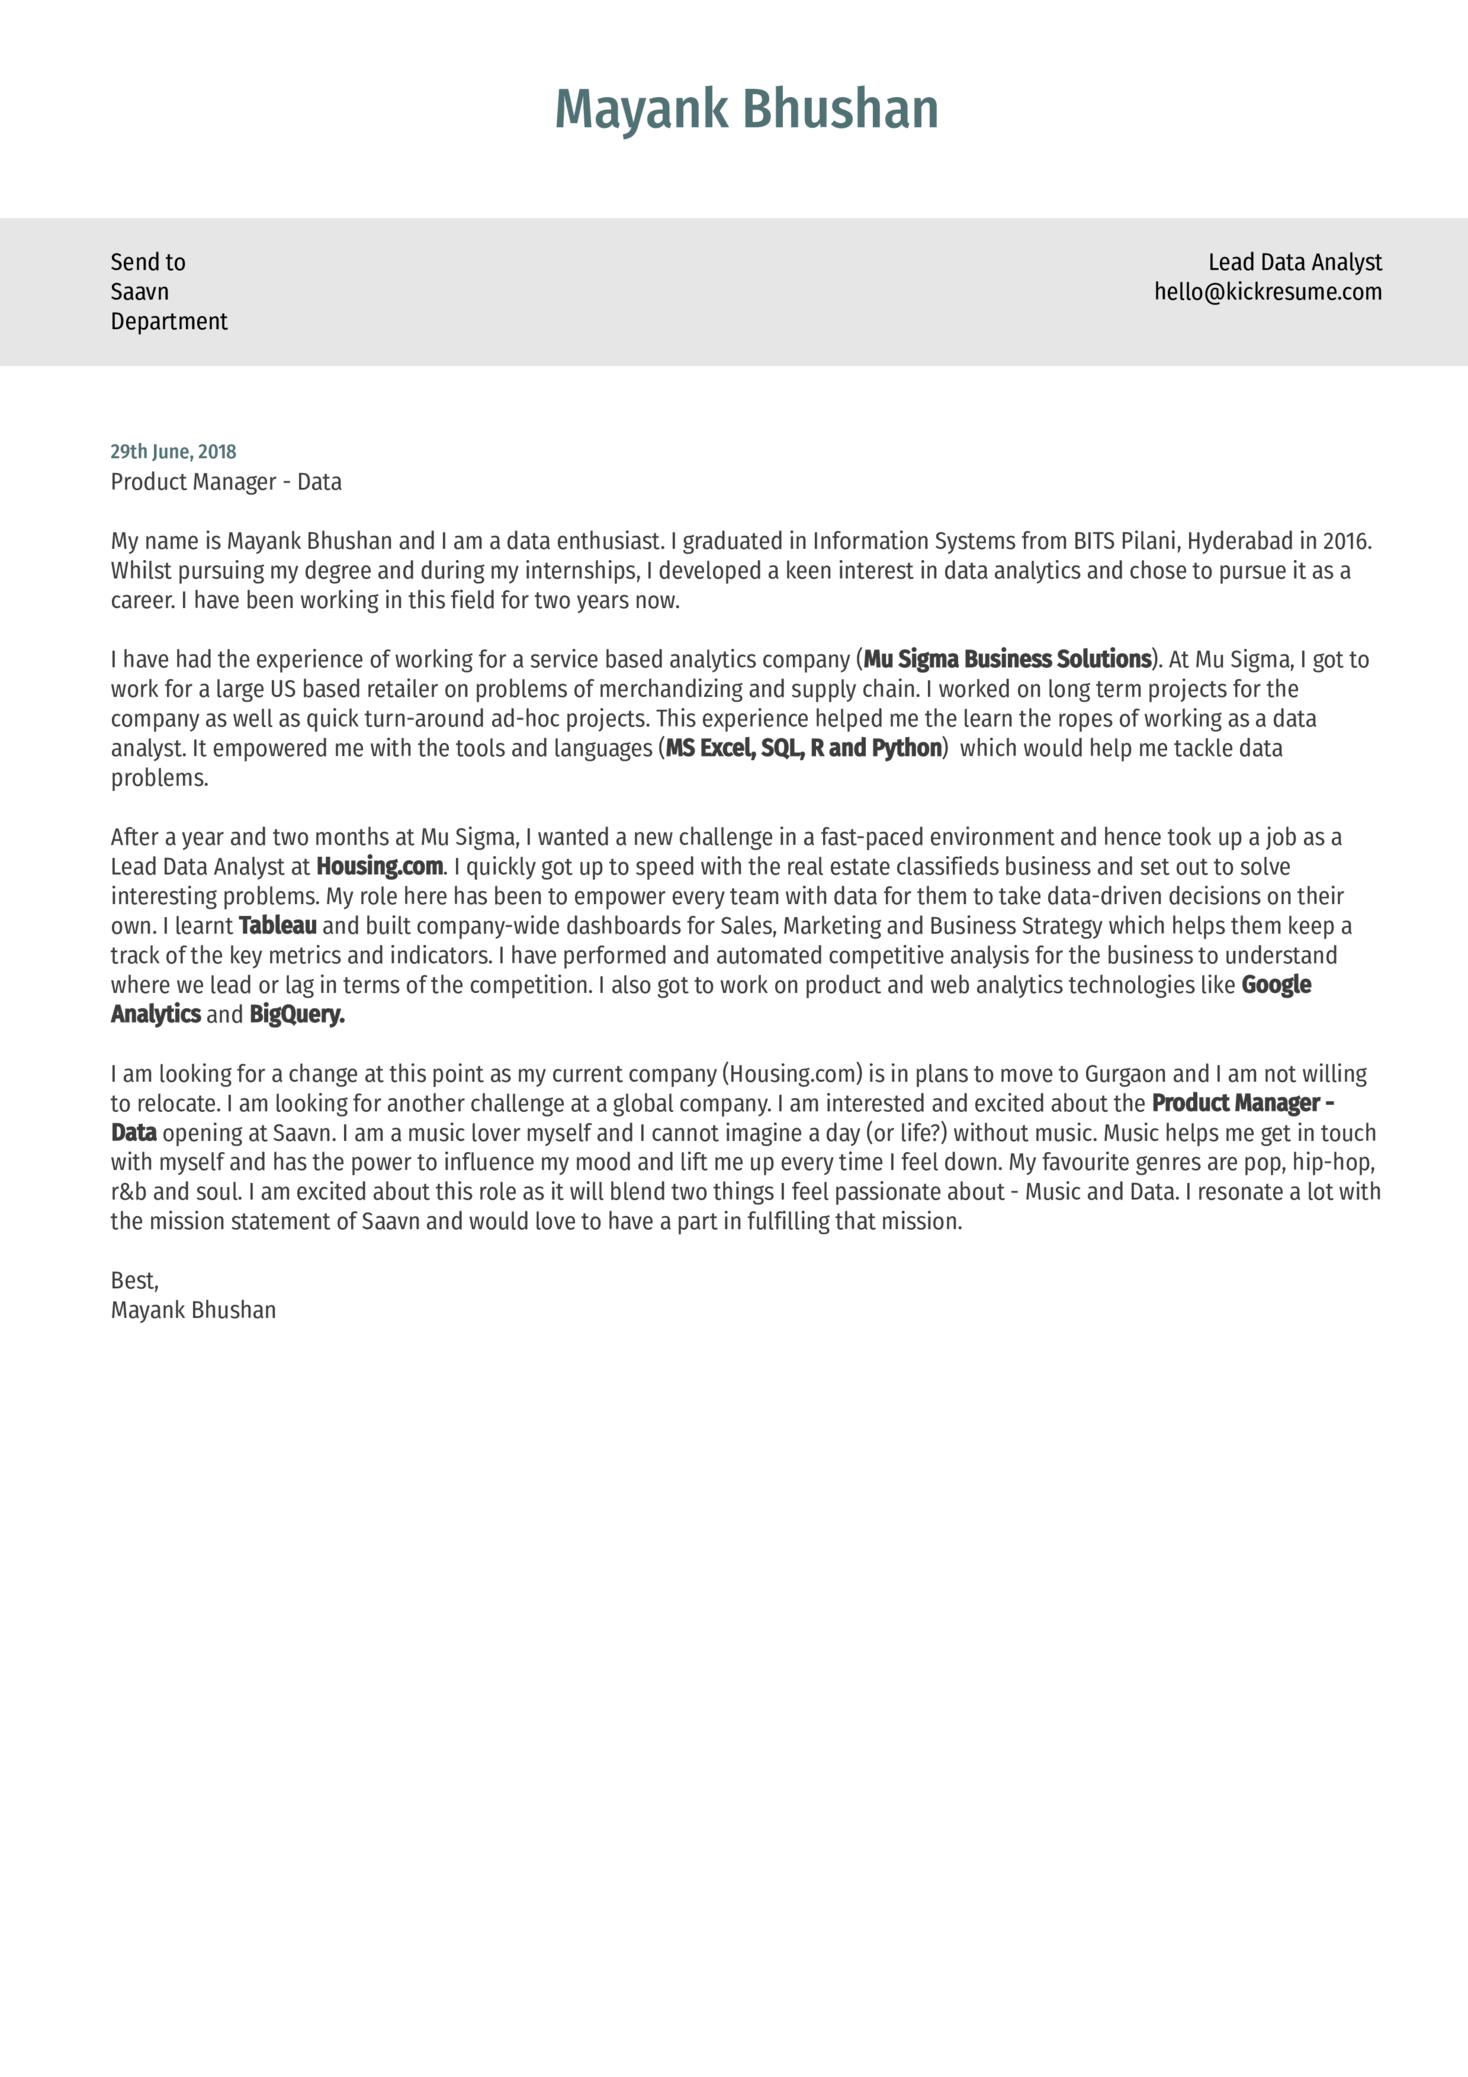 Lead Data Analyst Cover Letter Sample